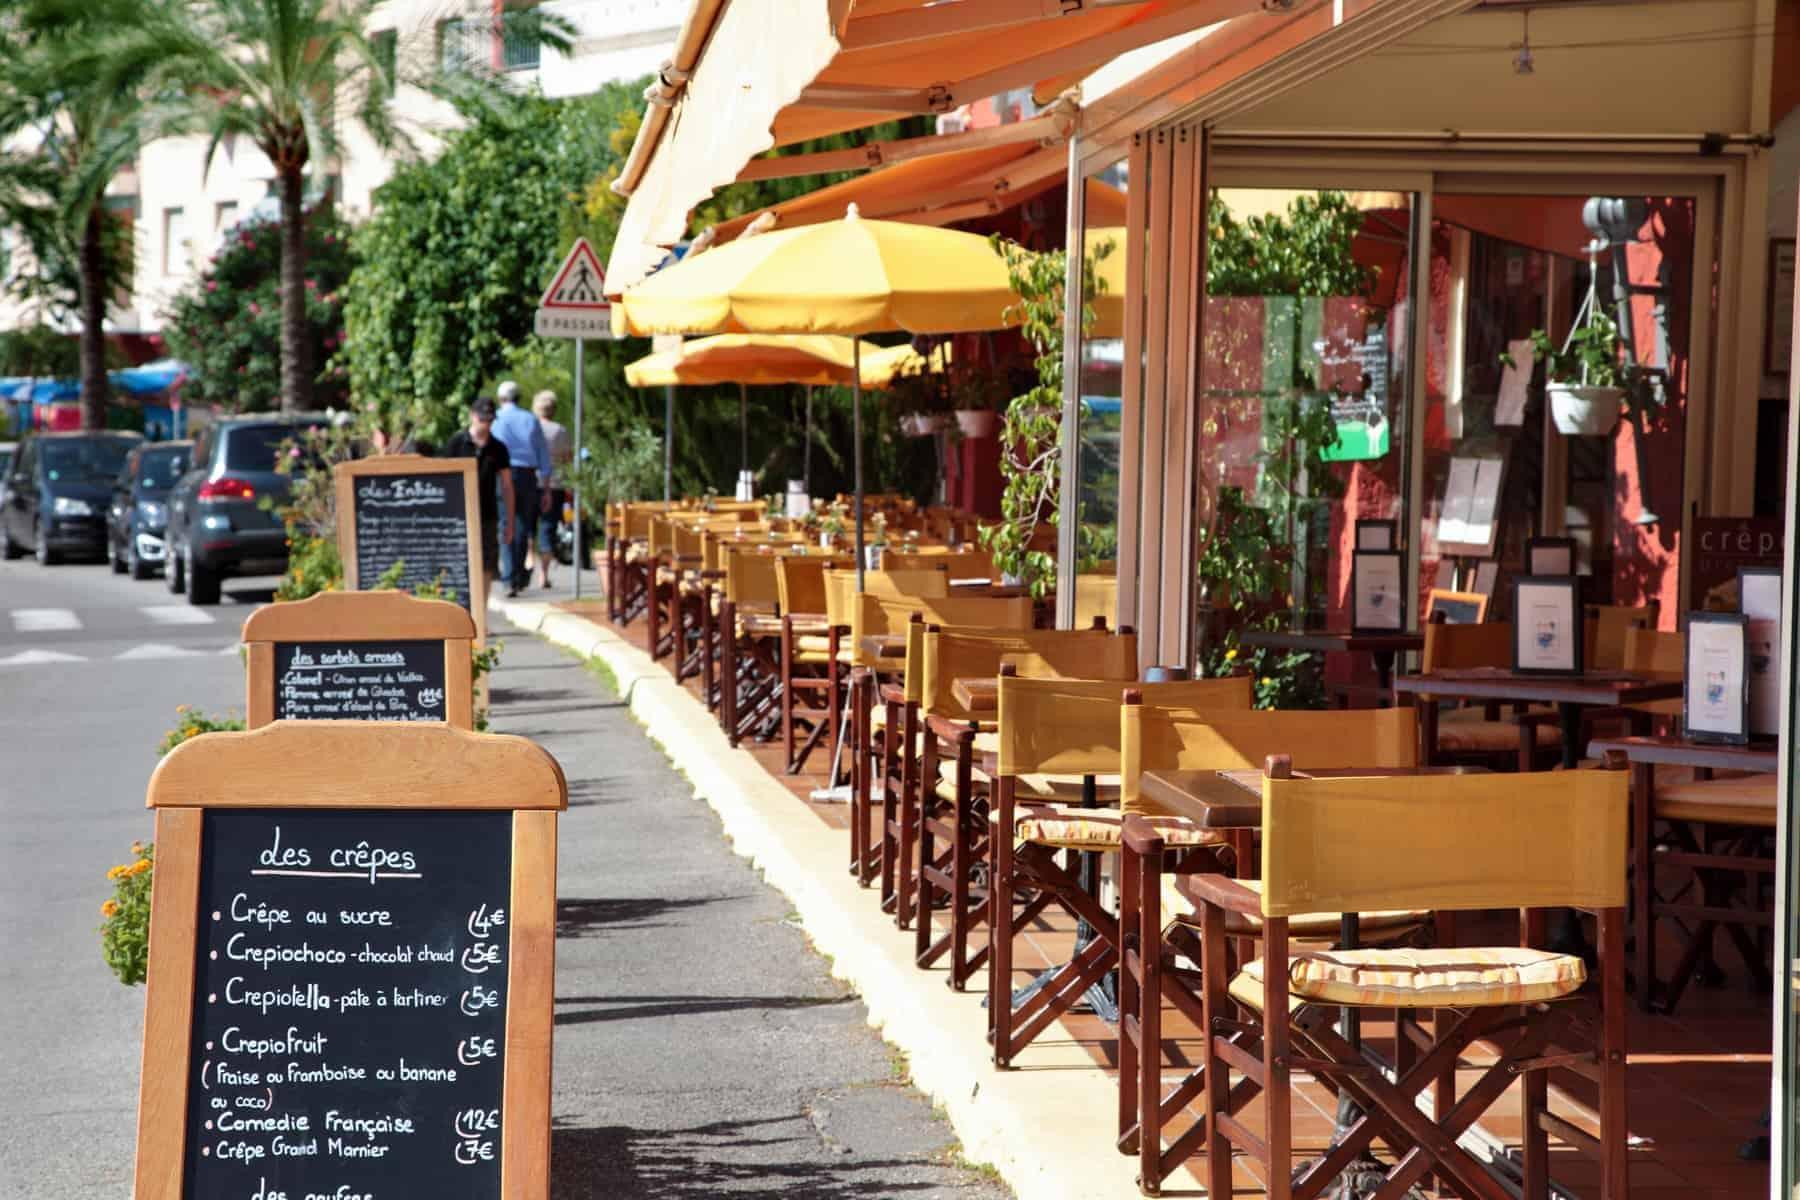 Fransk mad er synonymt med de hyggelige fortorvs restauranter